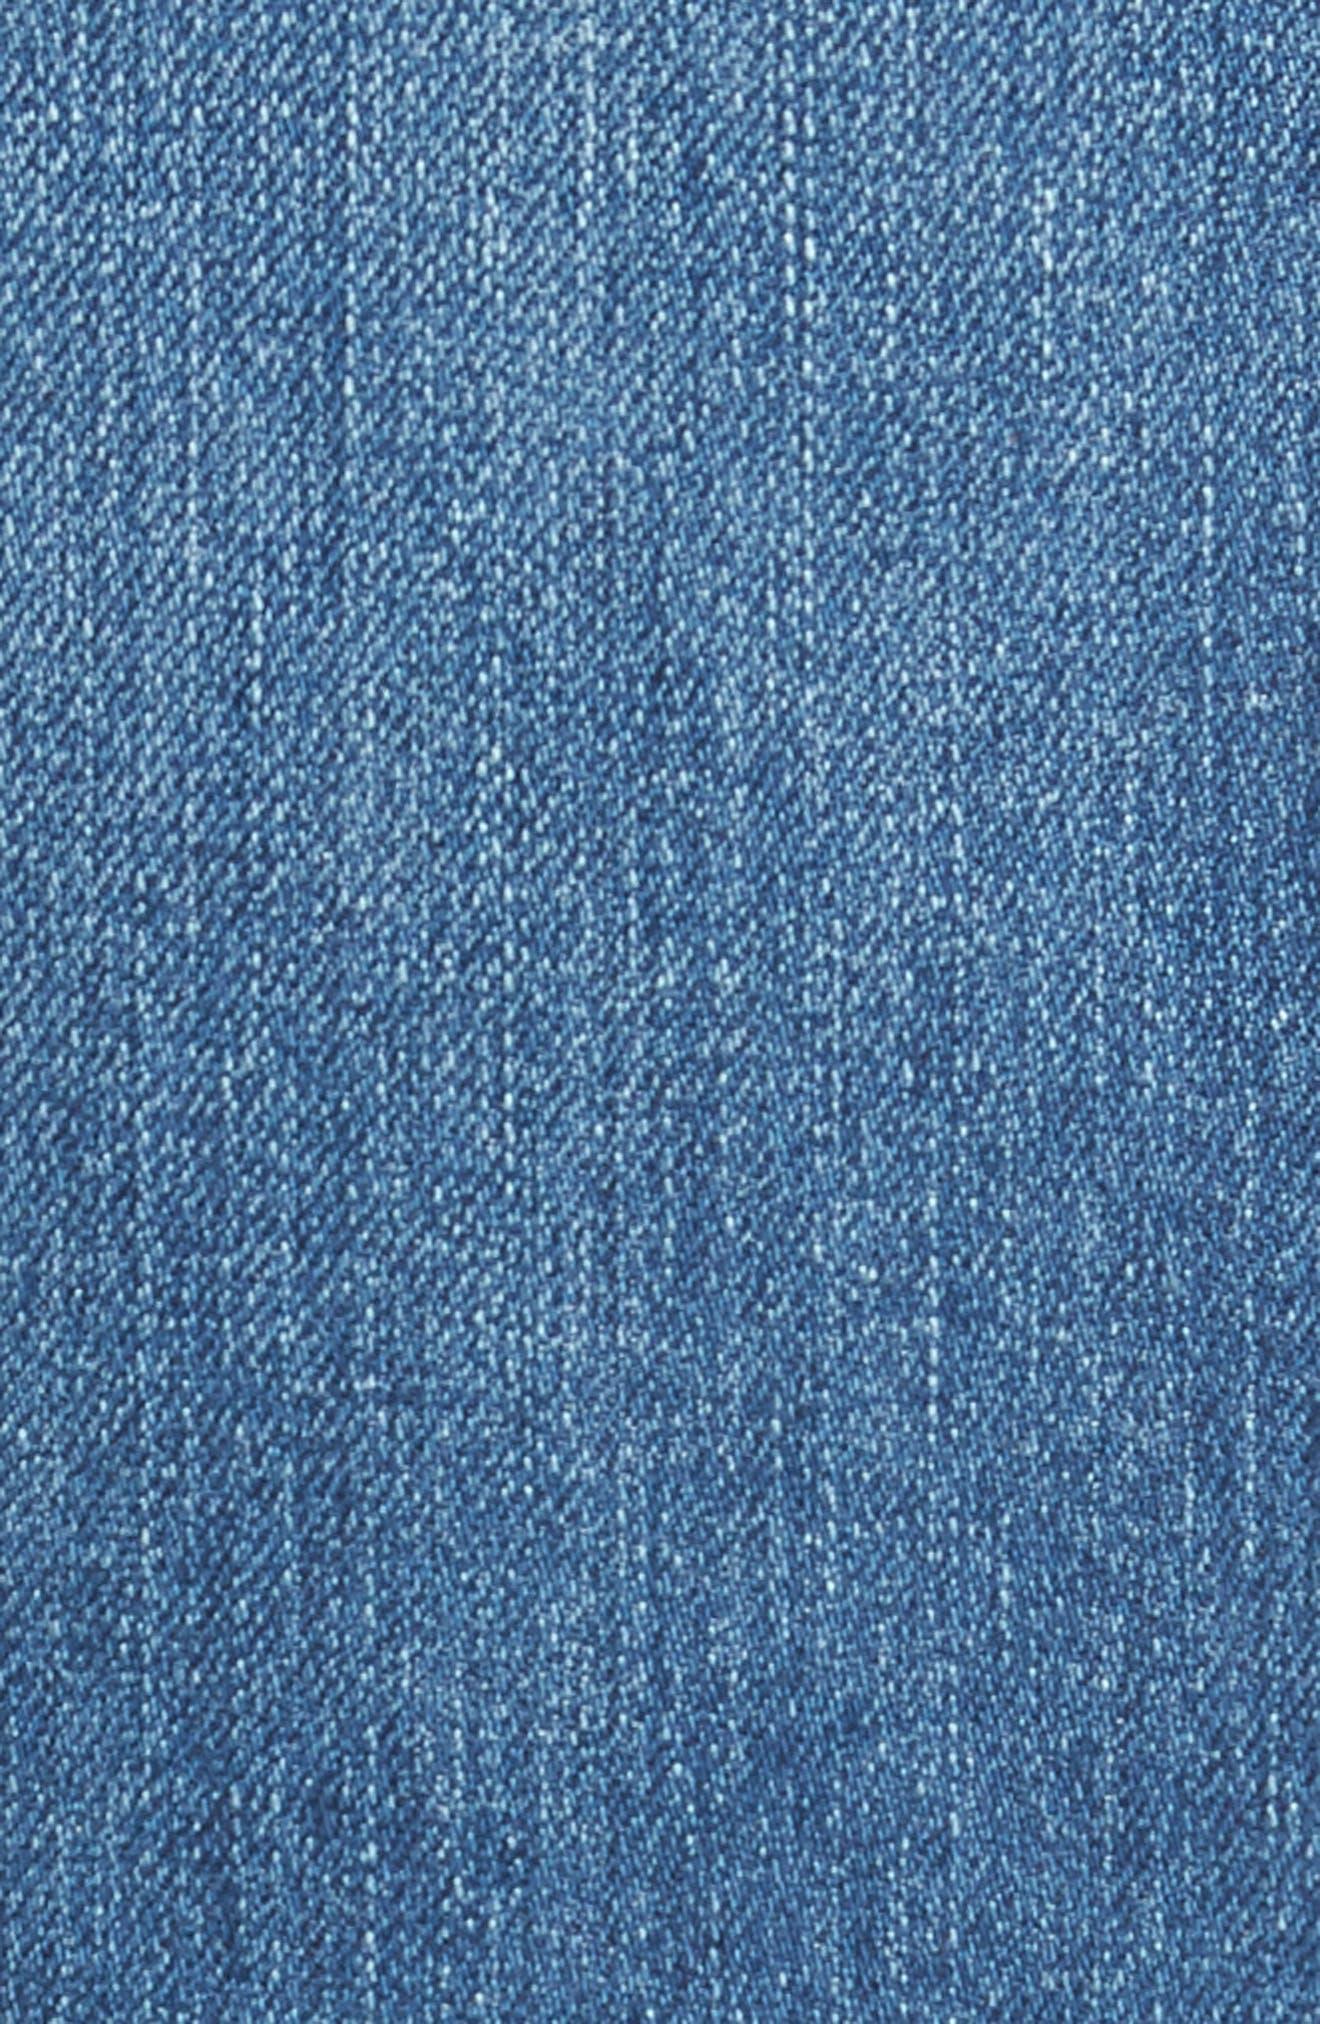 Graduate Slim Straight Leg Jeans,                             Alternate thumbnail 5, color,                             DEMOLITION